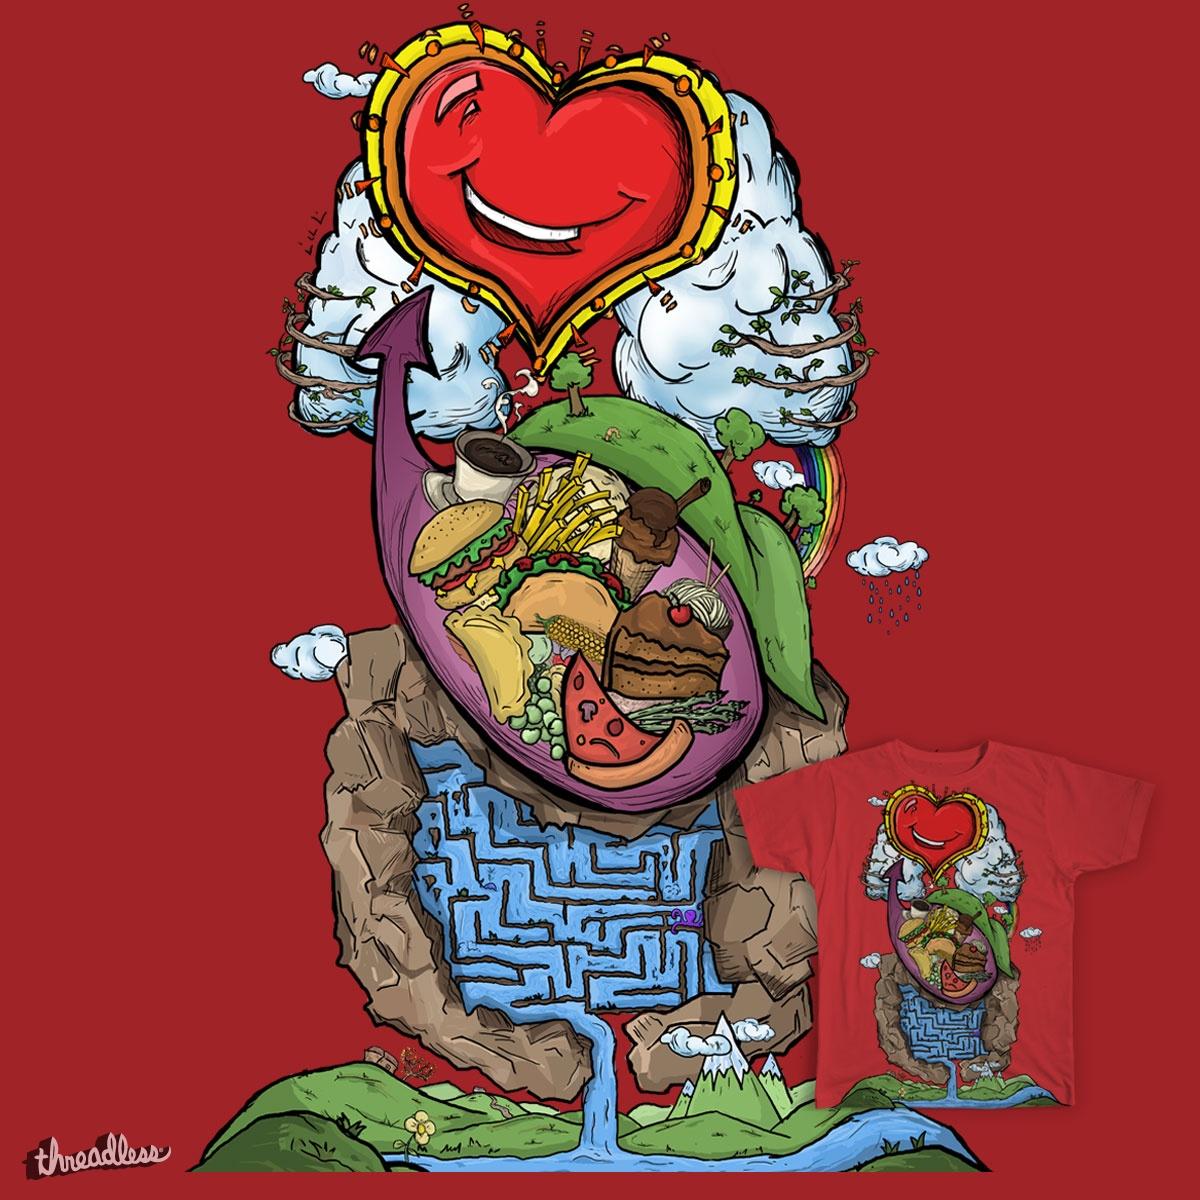 a full stomach makes a happy heart by andresgomezisaza on Threadless